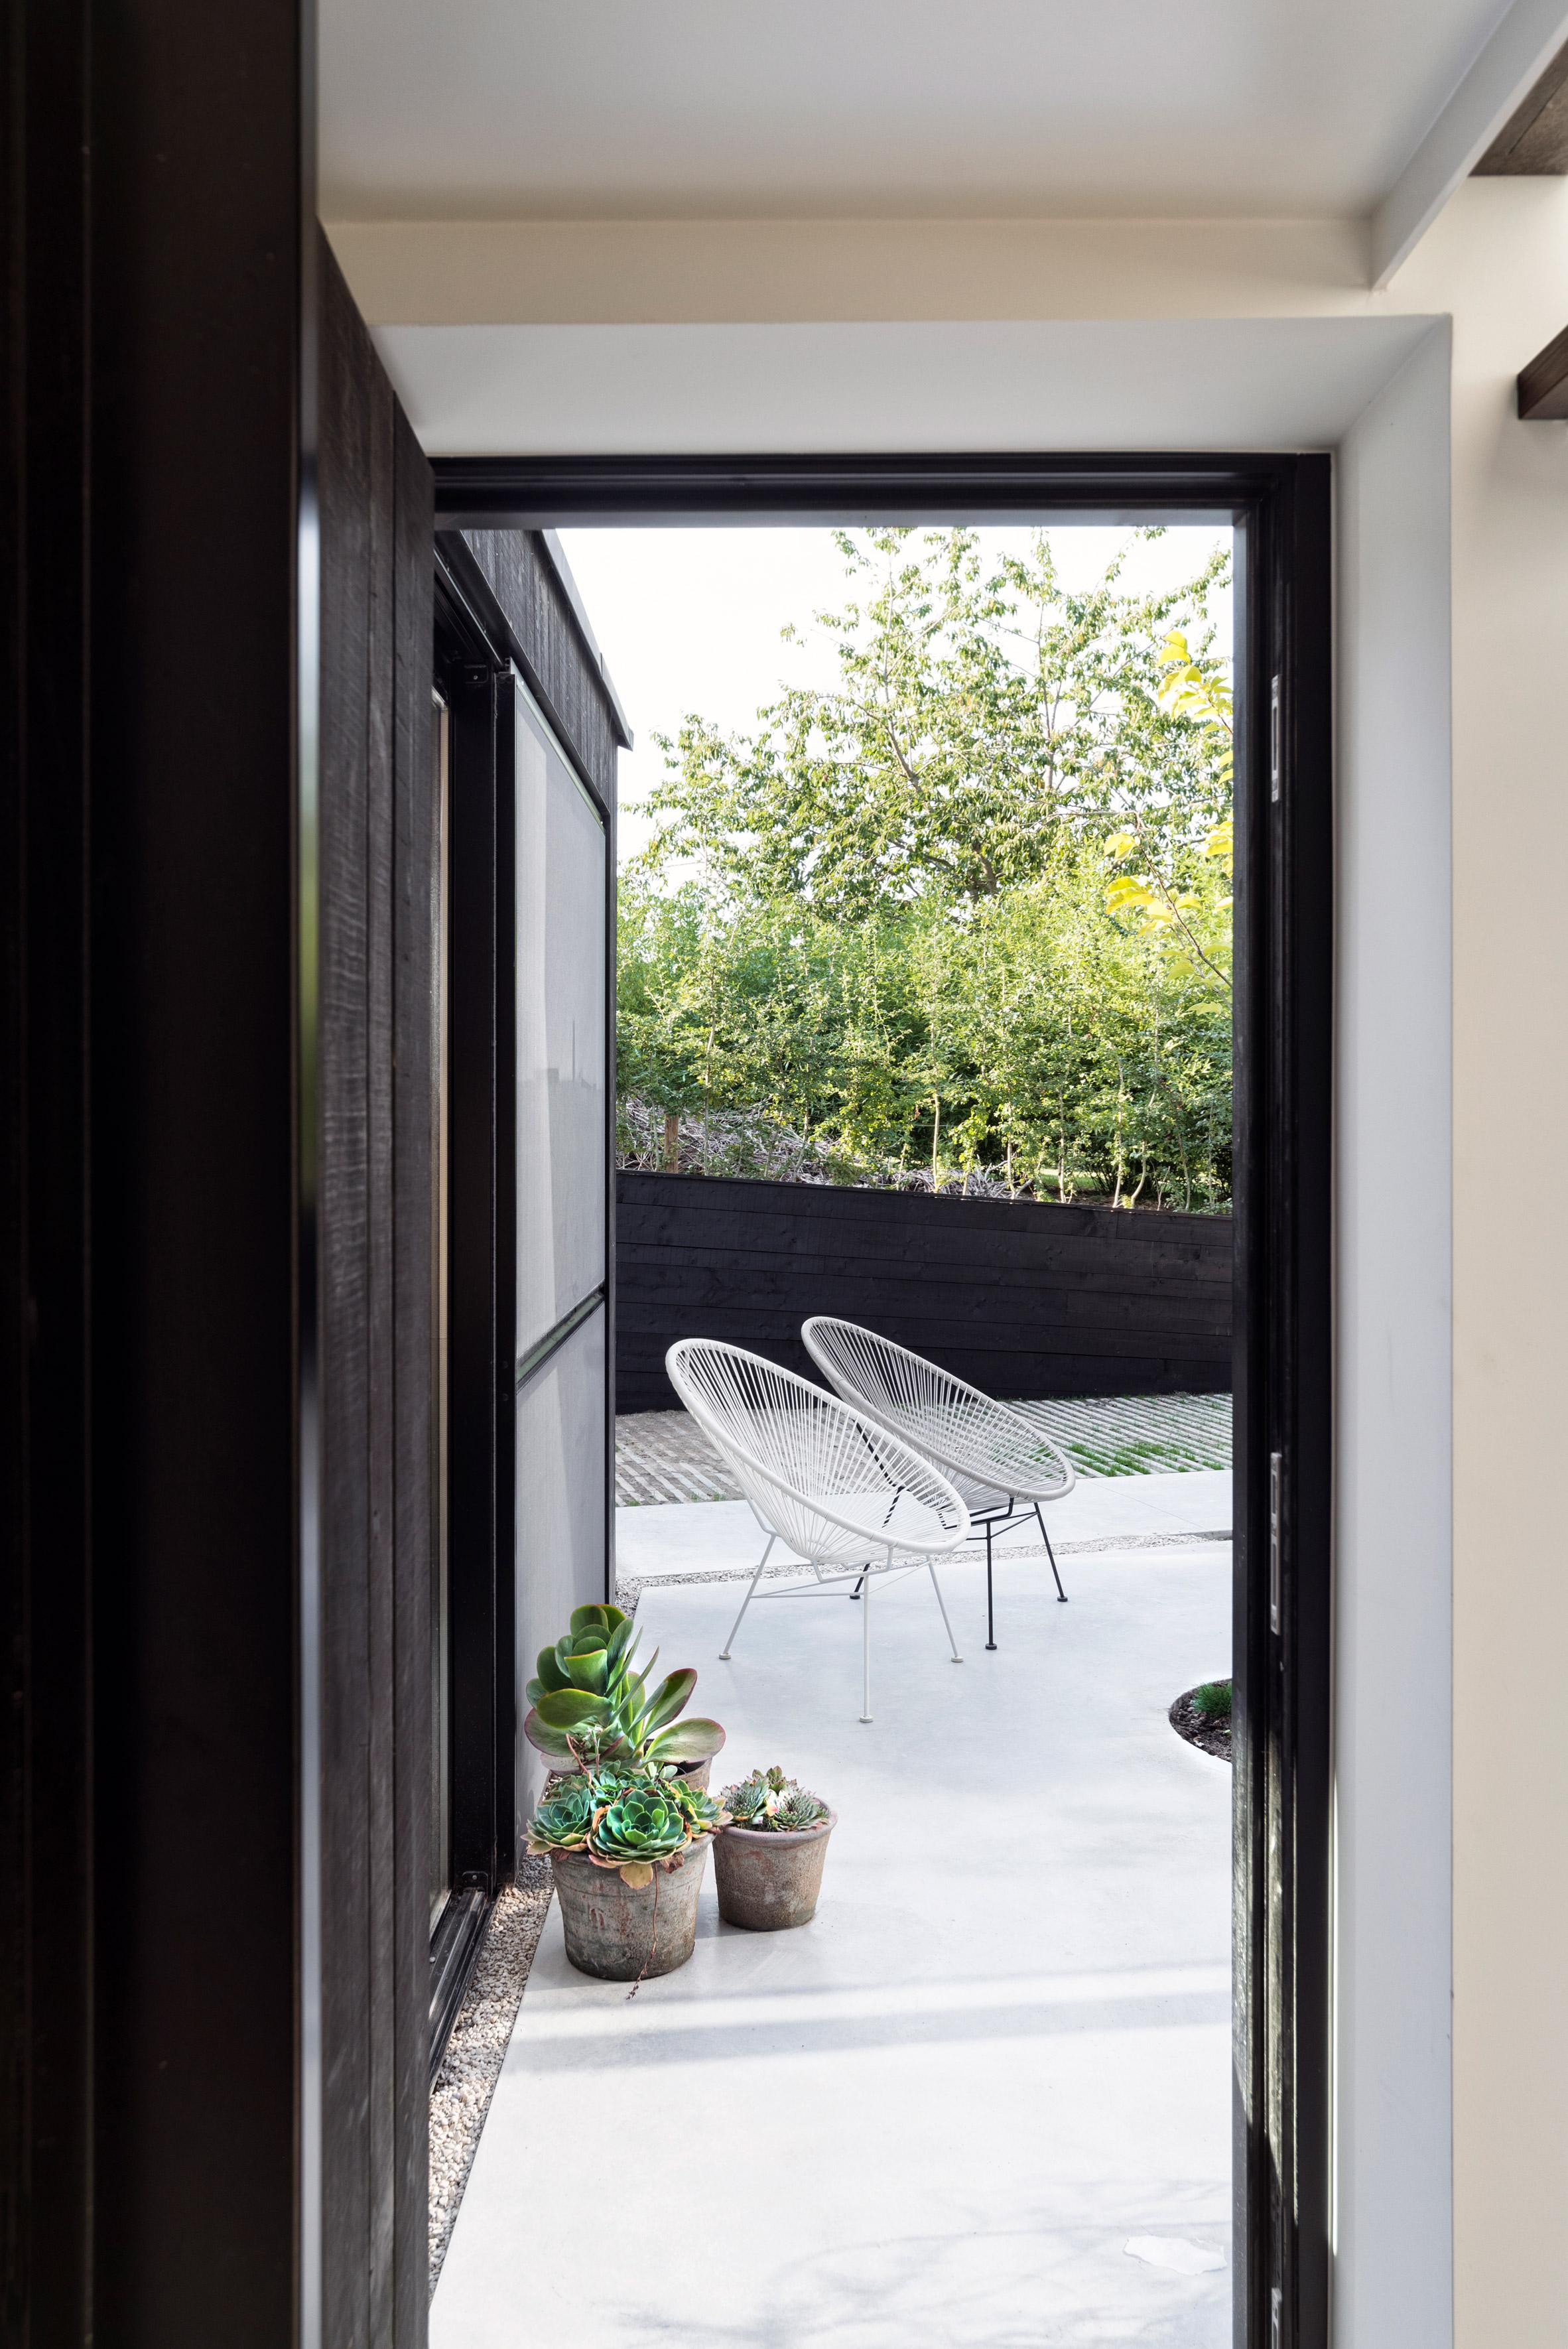 architecture-semi-detached-house-with-an-outdoor-areadesign-studia-interiors-osnovadesign-osnova-poltava_05